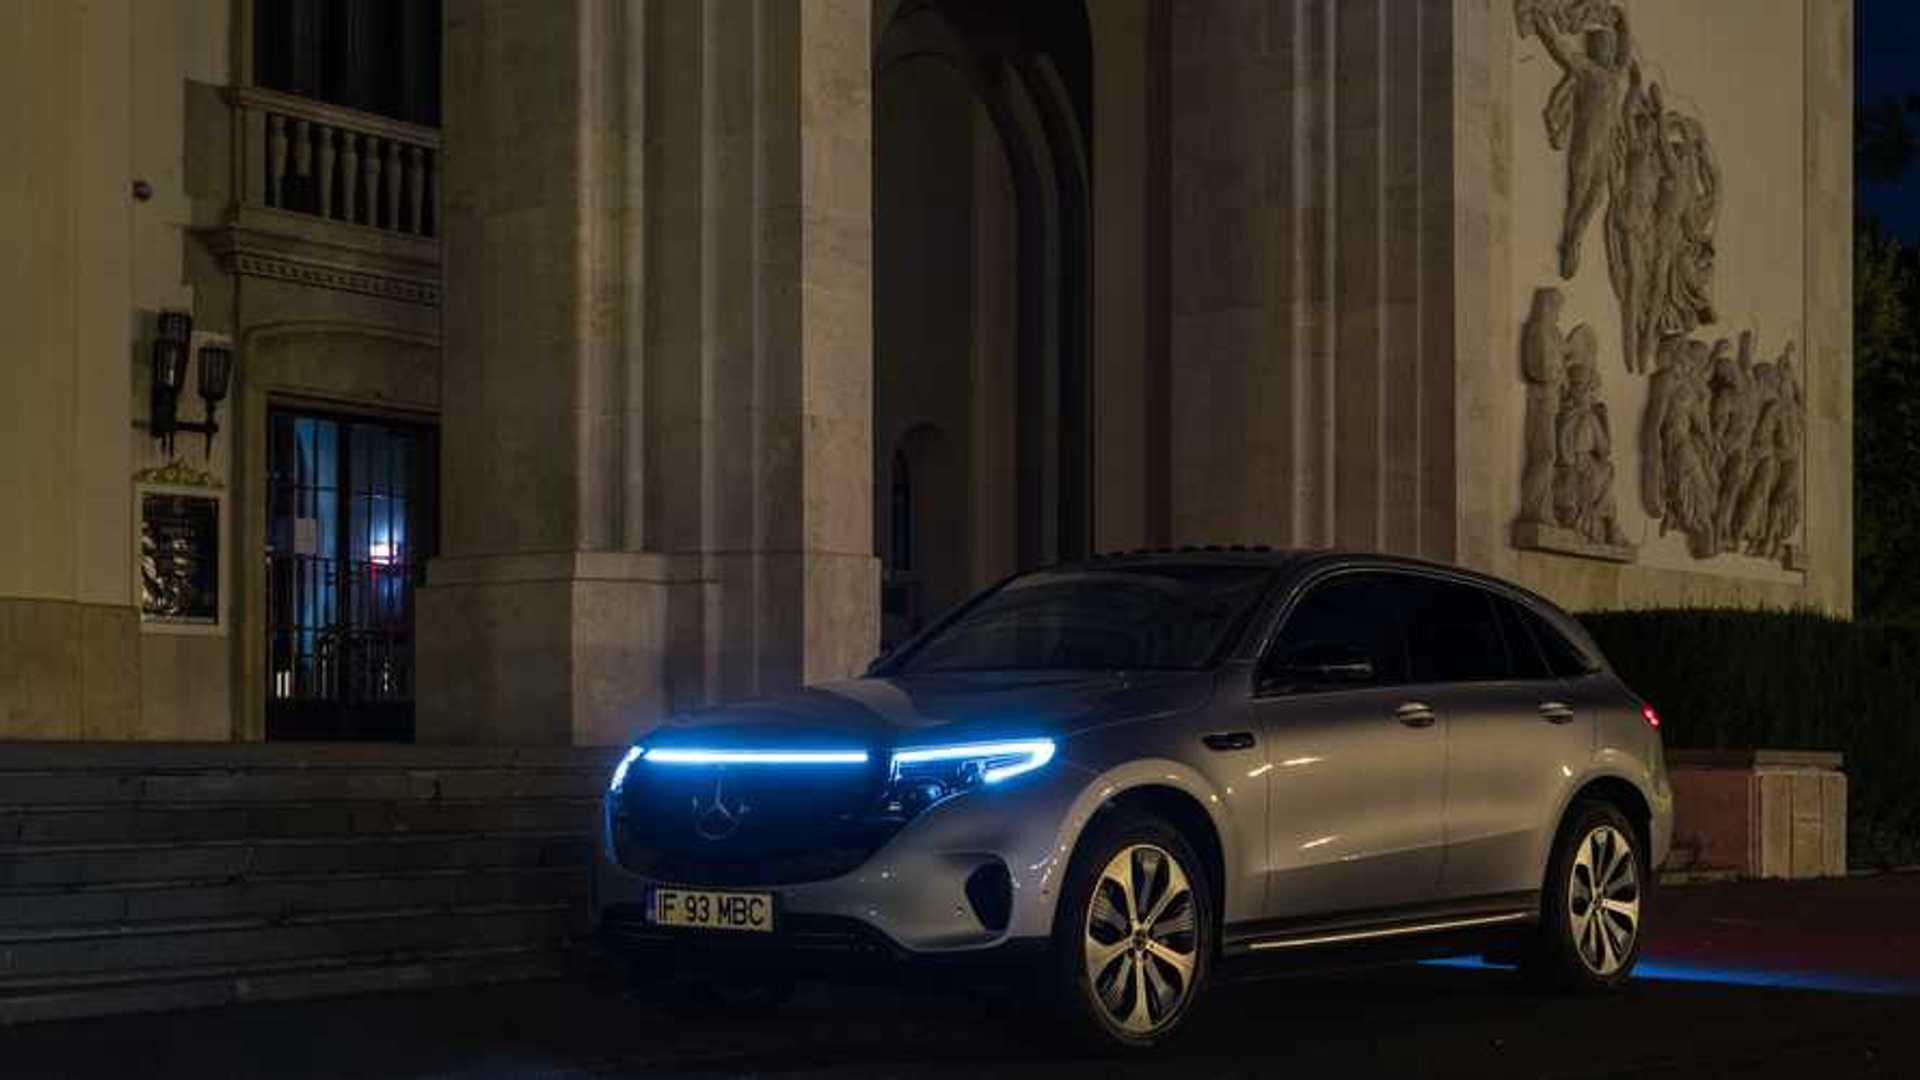 Daimler shareholder calls Mercedes EQC 'too late, too expensive and too boring'